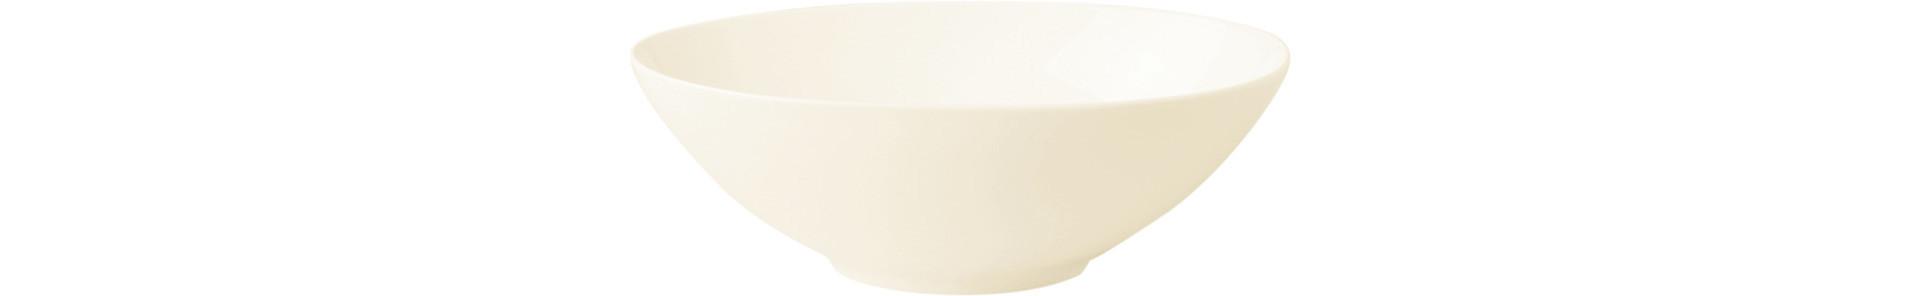 Fine Dine, Salatschale oval 160 x 100 mm / 0,31 l creme